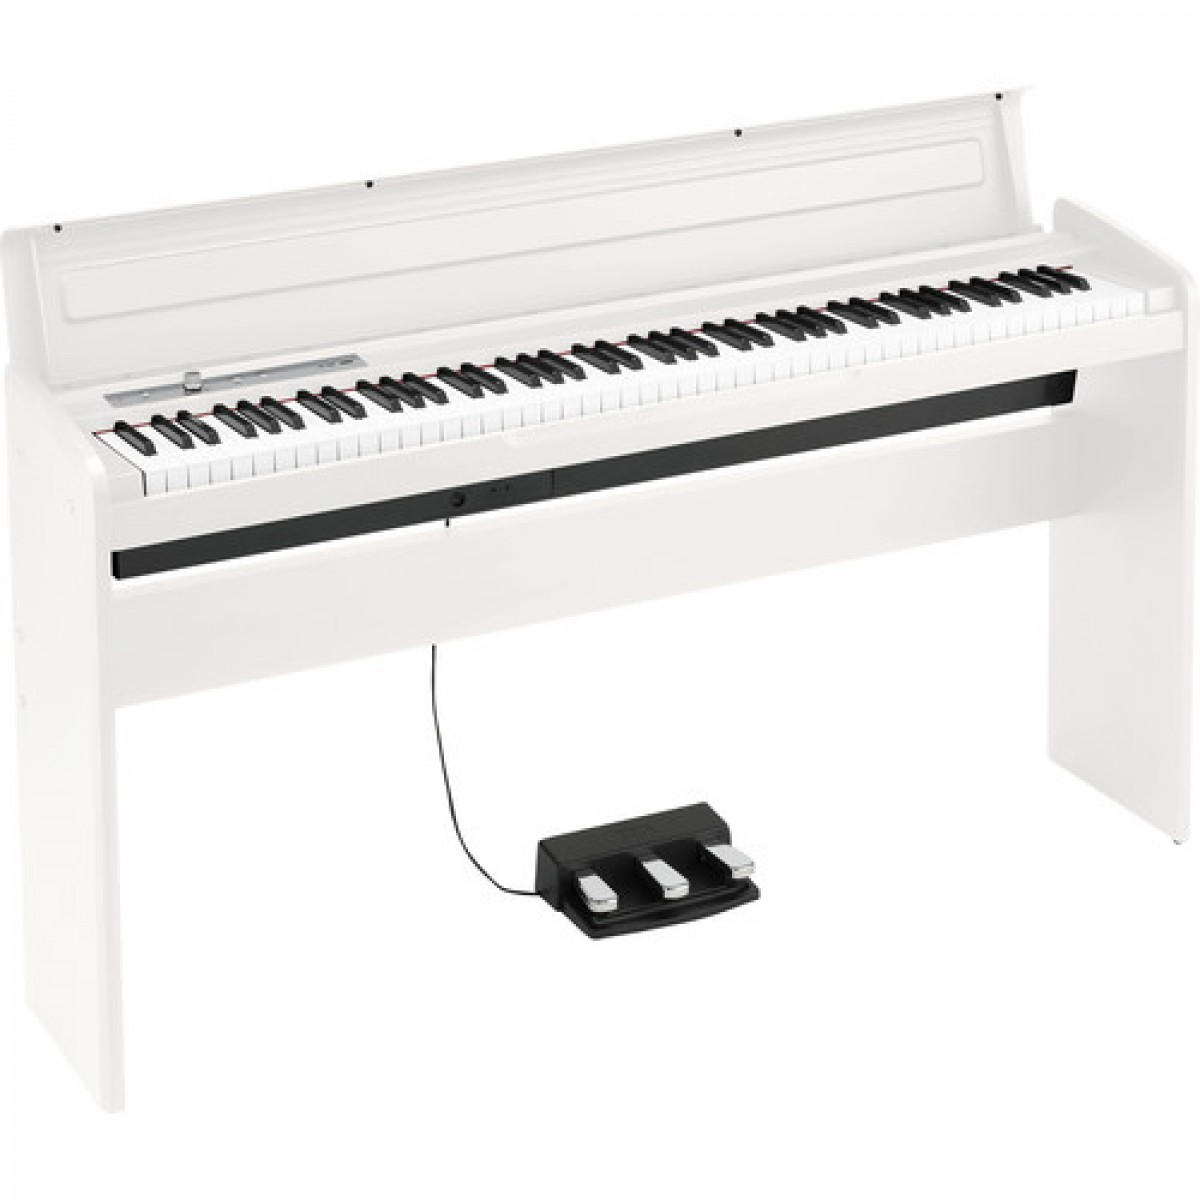 korg lp 180 buy digital piano best price. Black Bedroom Furniture Sets. Home Design Ideas